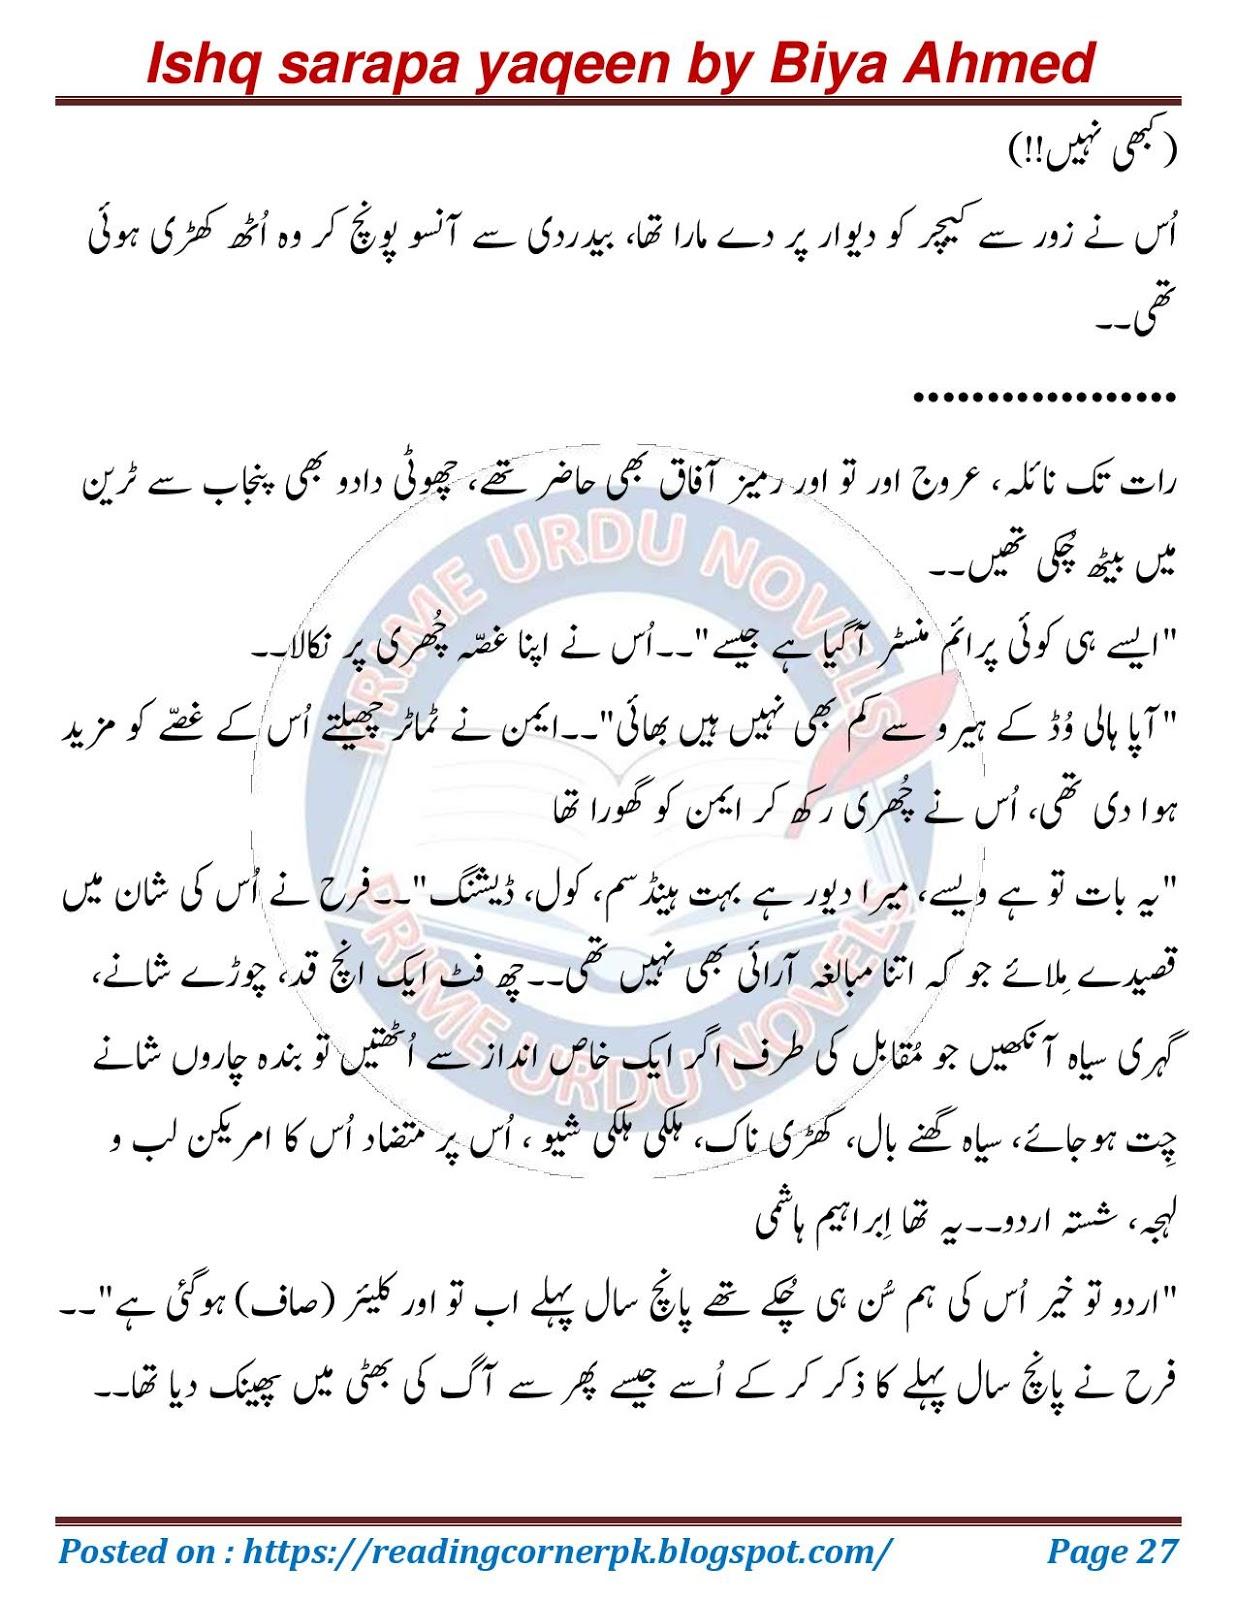 Ishq Sarapa Yaqeen By Biya Ahmed Complete Kidnapping Based